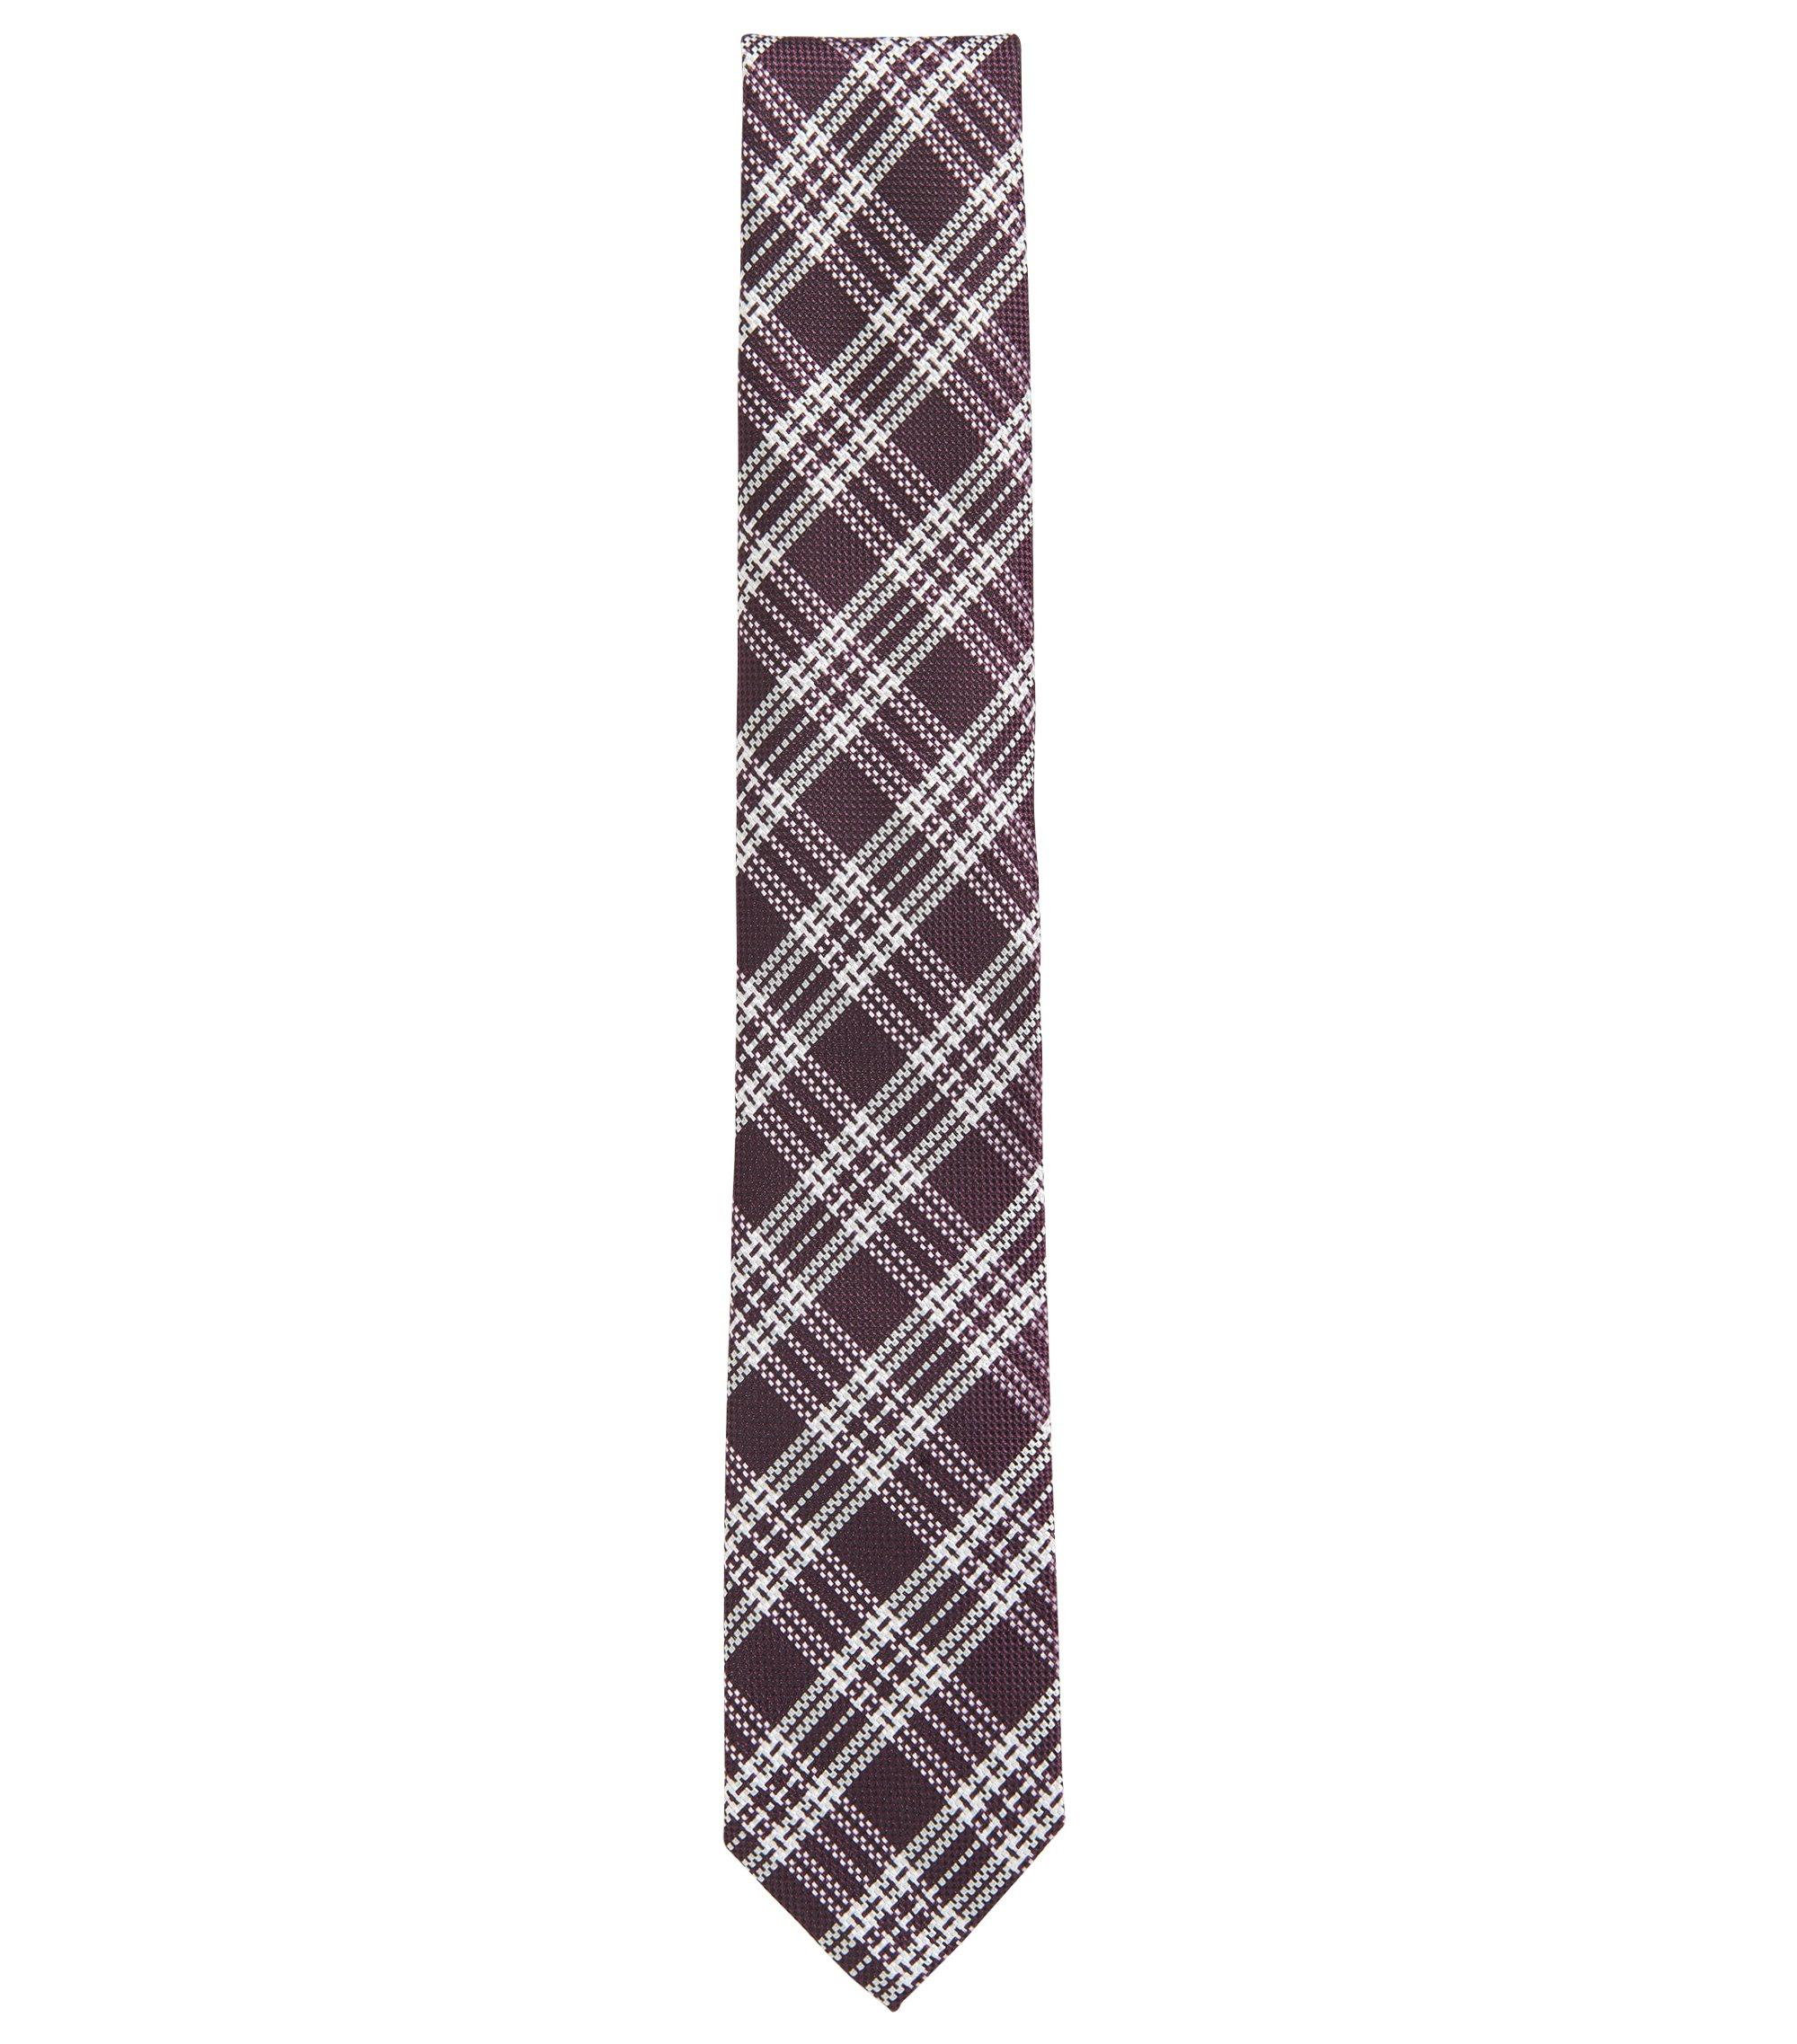 Karierte Krawatte aus Seiden-Jacquard, Dunkelrosa